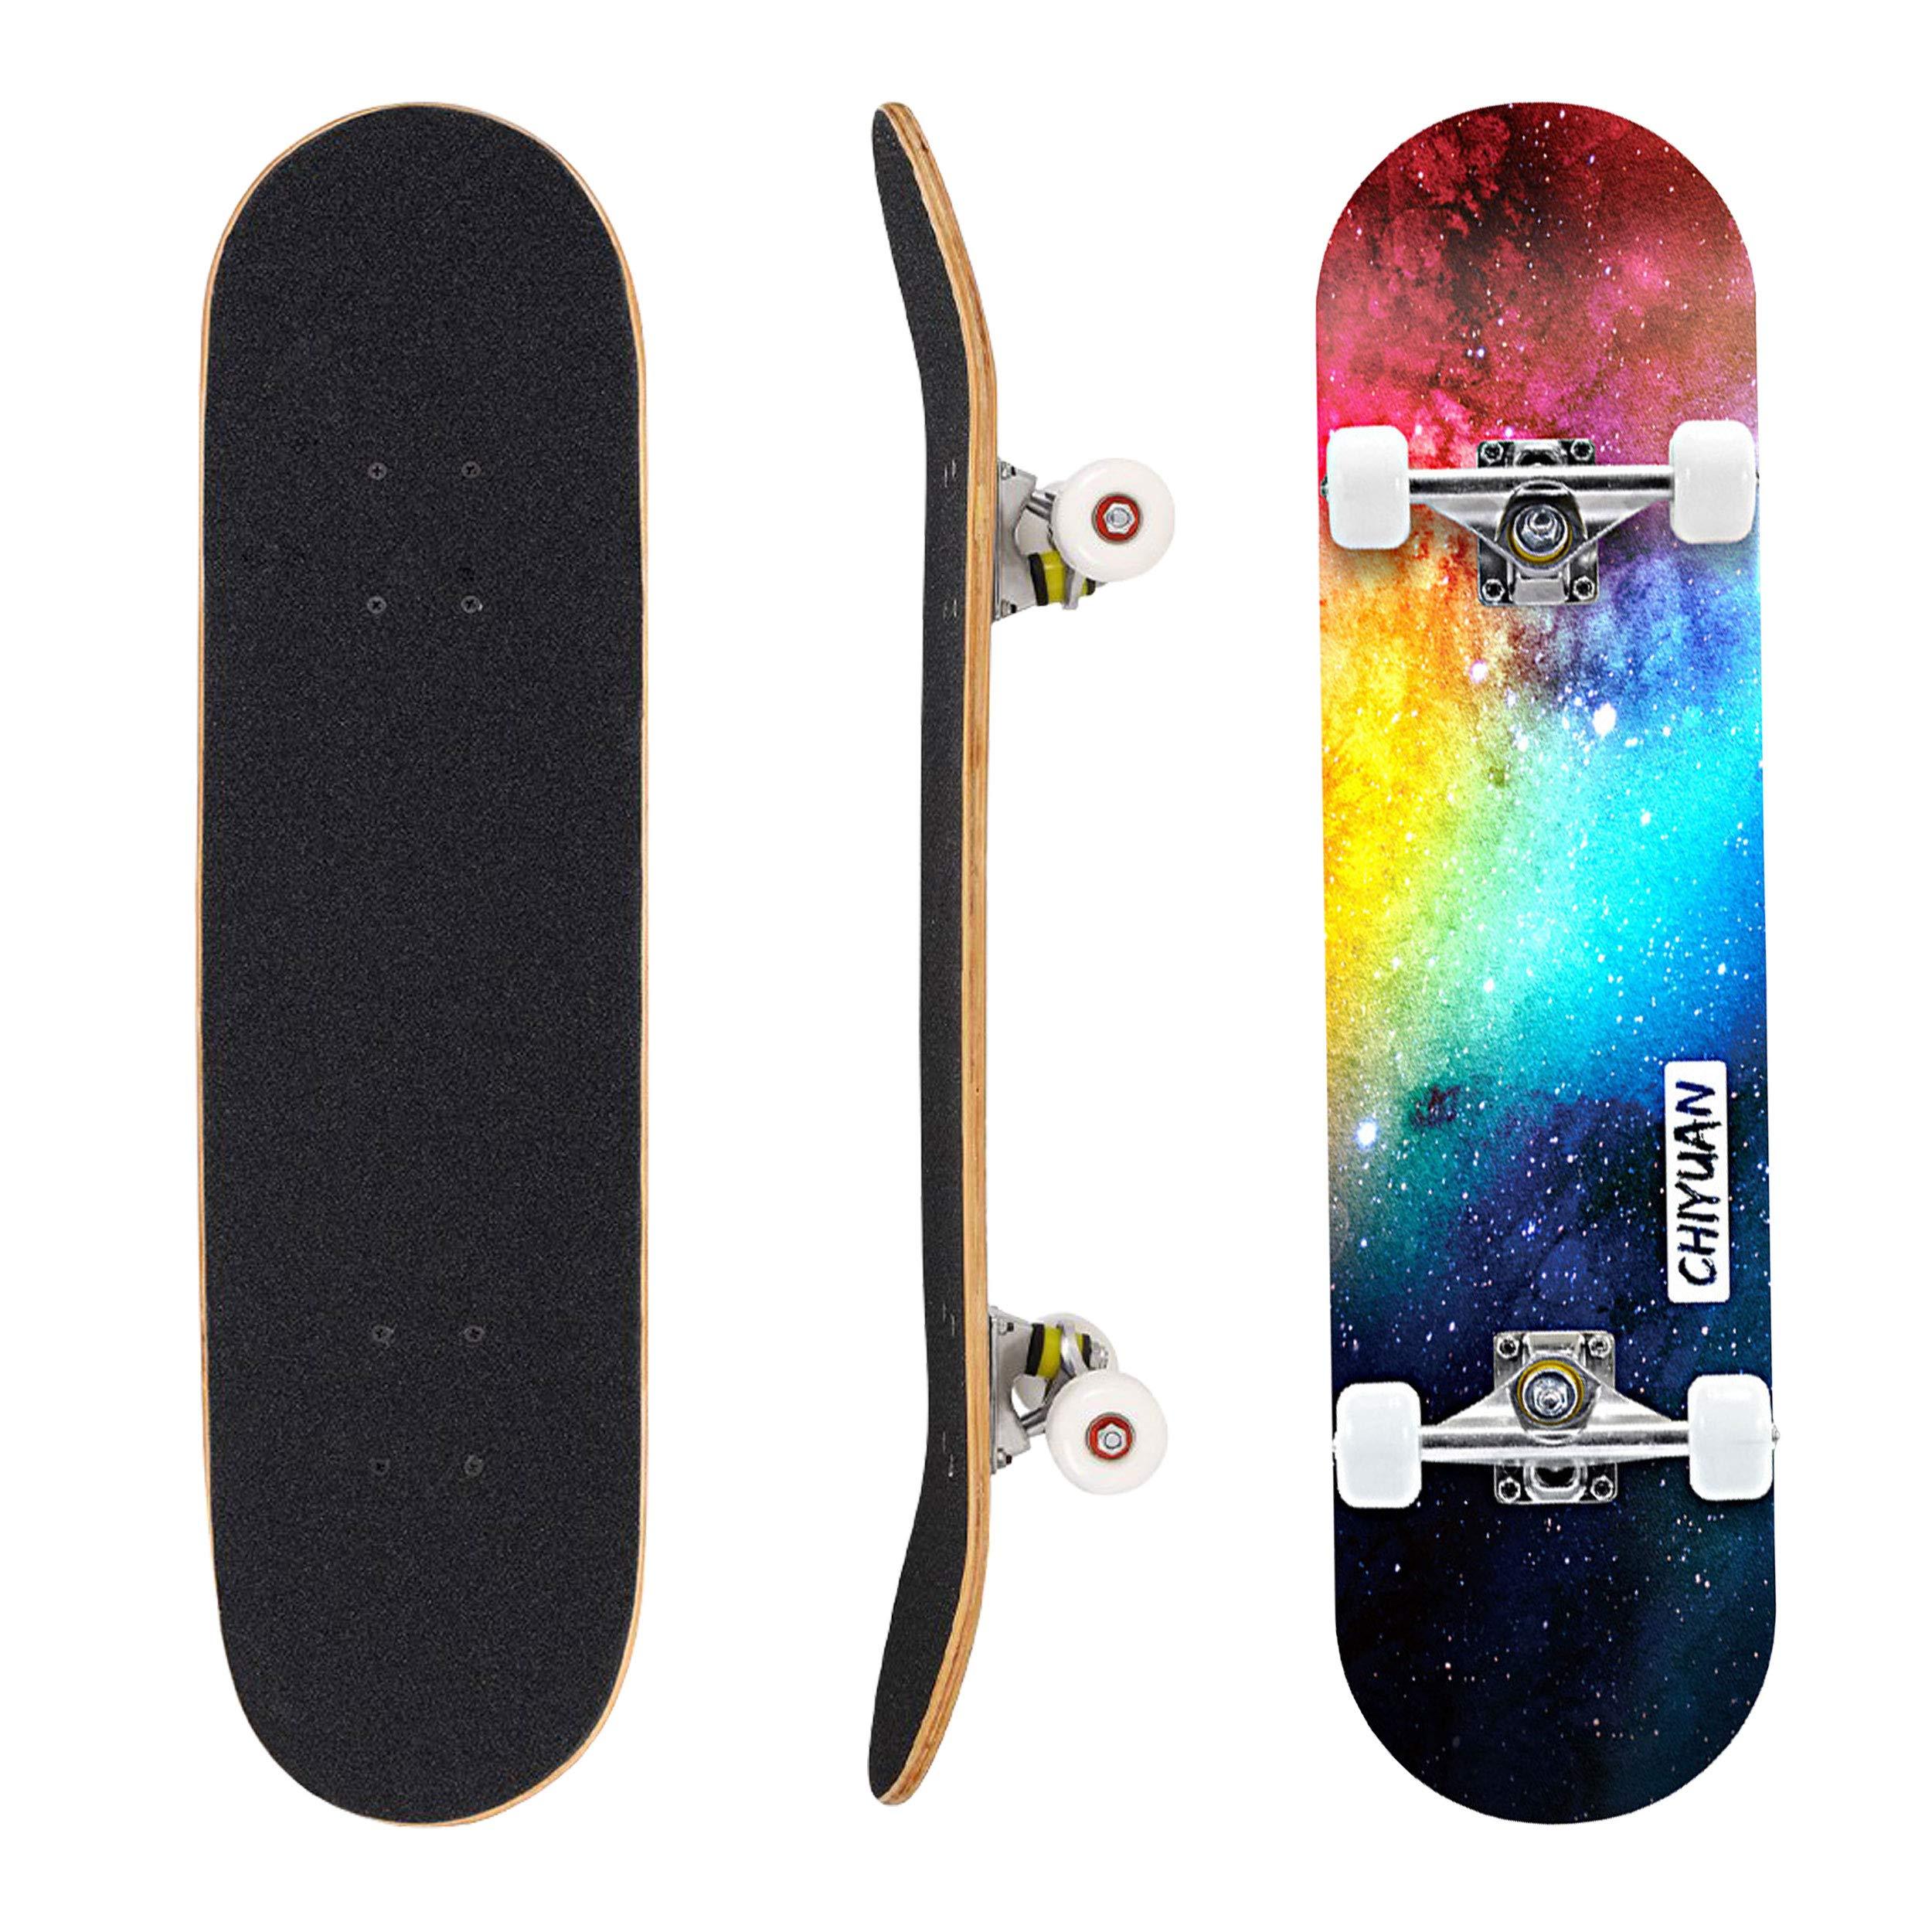 Geelife Skateboard 7 Layers Decks 31''x8'' Pro Complete Skate Board Maple Wood Longboards for Teens Adults Beginners Girls Boys Kids (Nebulae) by Geelife